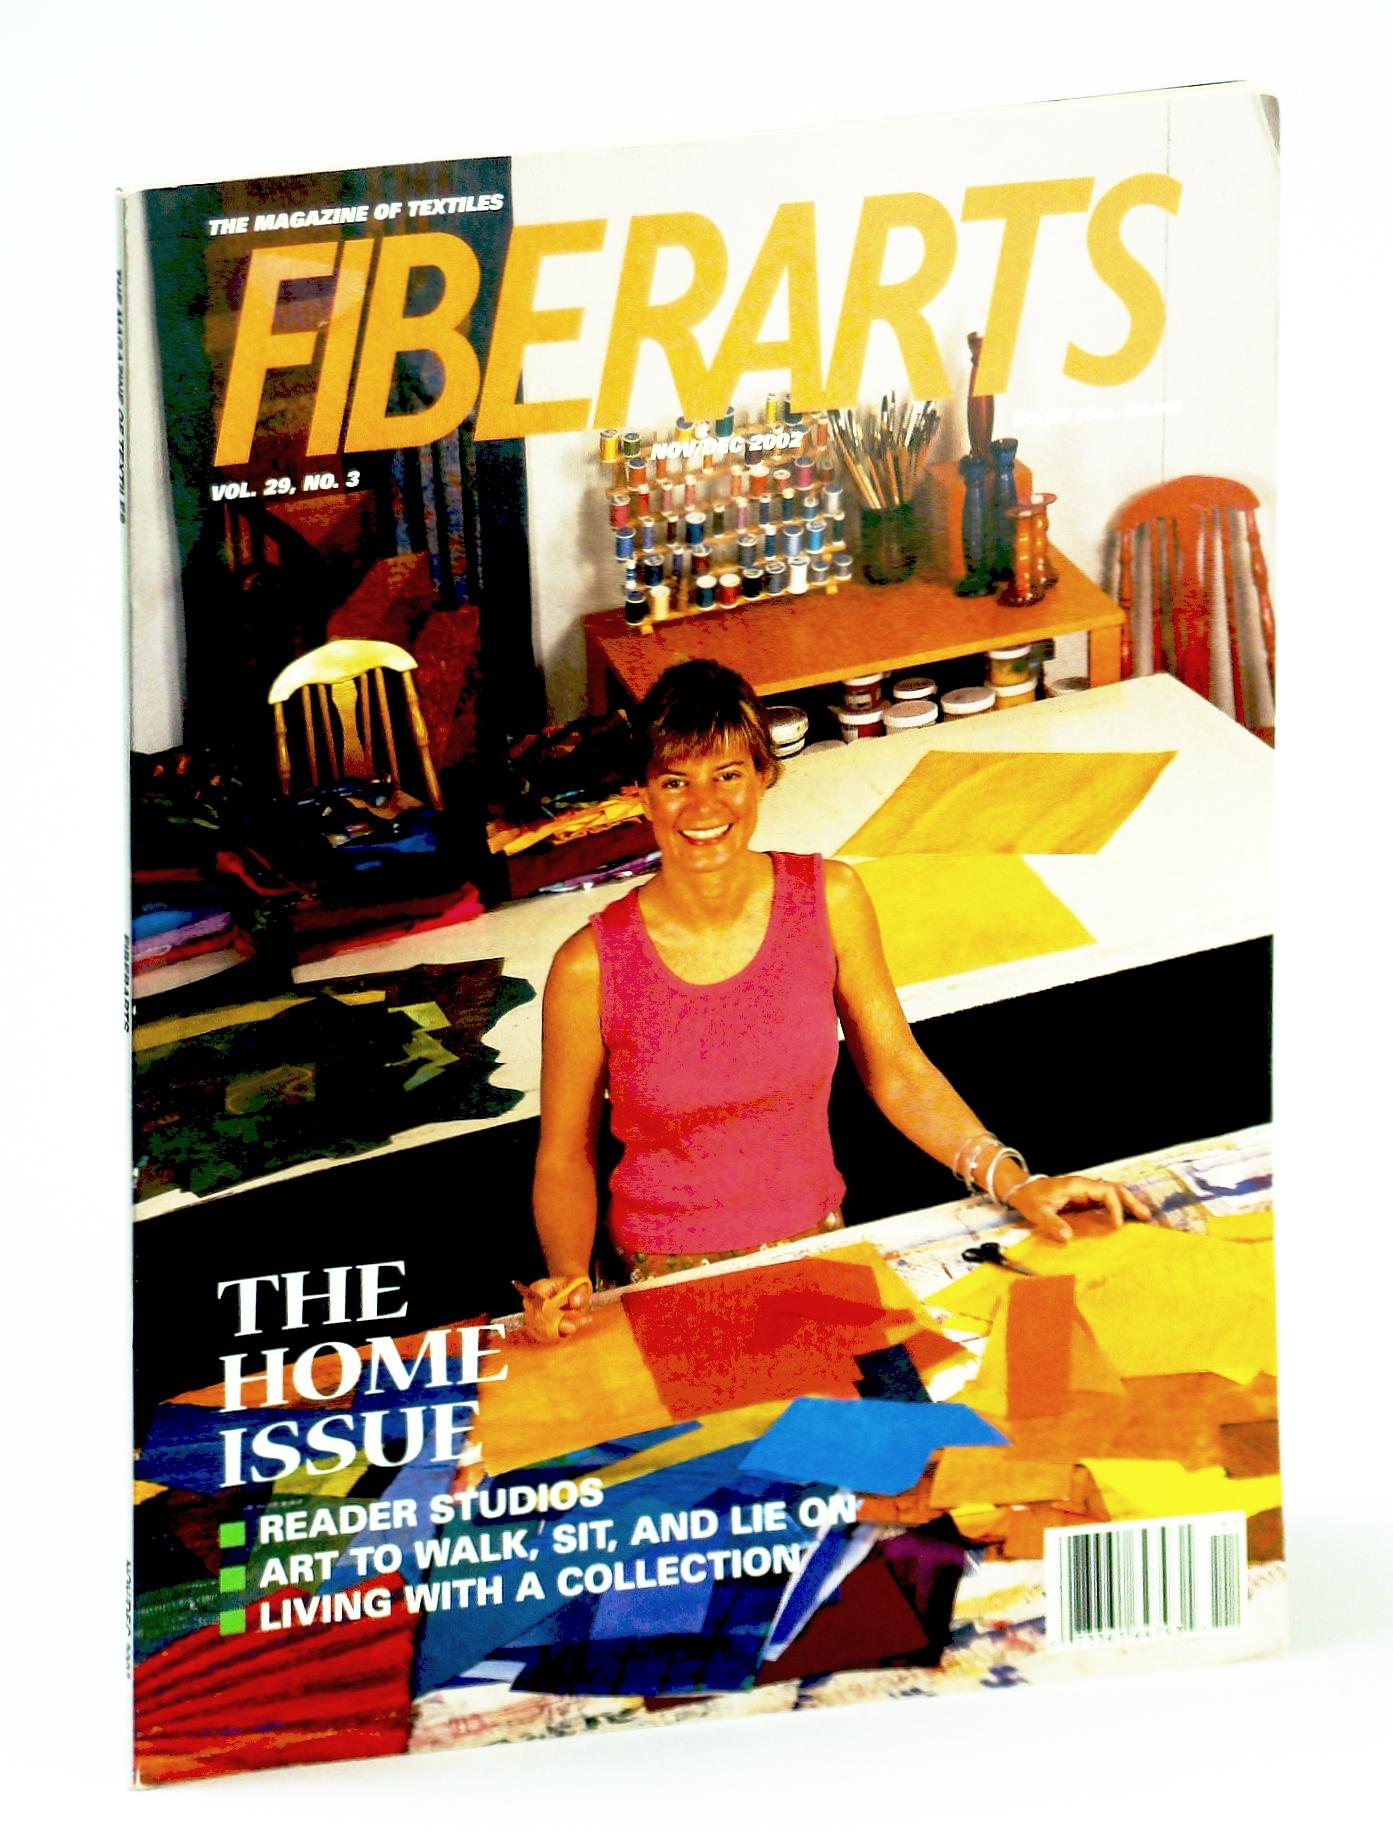 Image for Fiberarts, The Magazine of Textiles,  November / December (Nov. / Dec.) 2002: The Home Issue